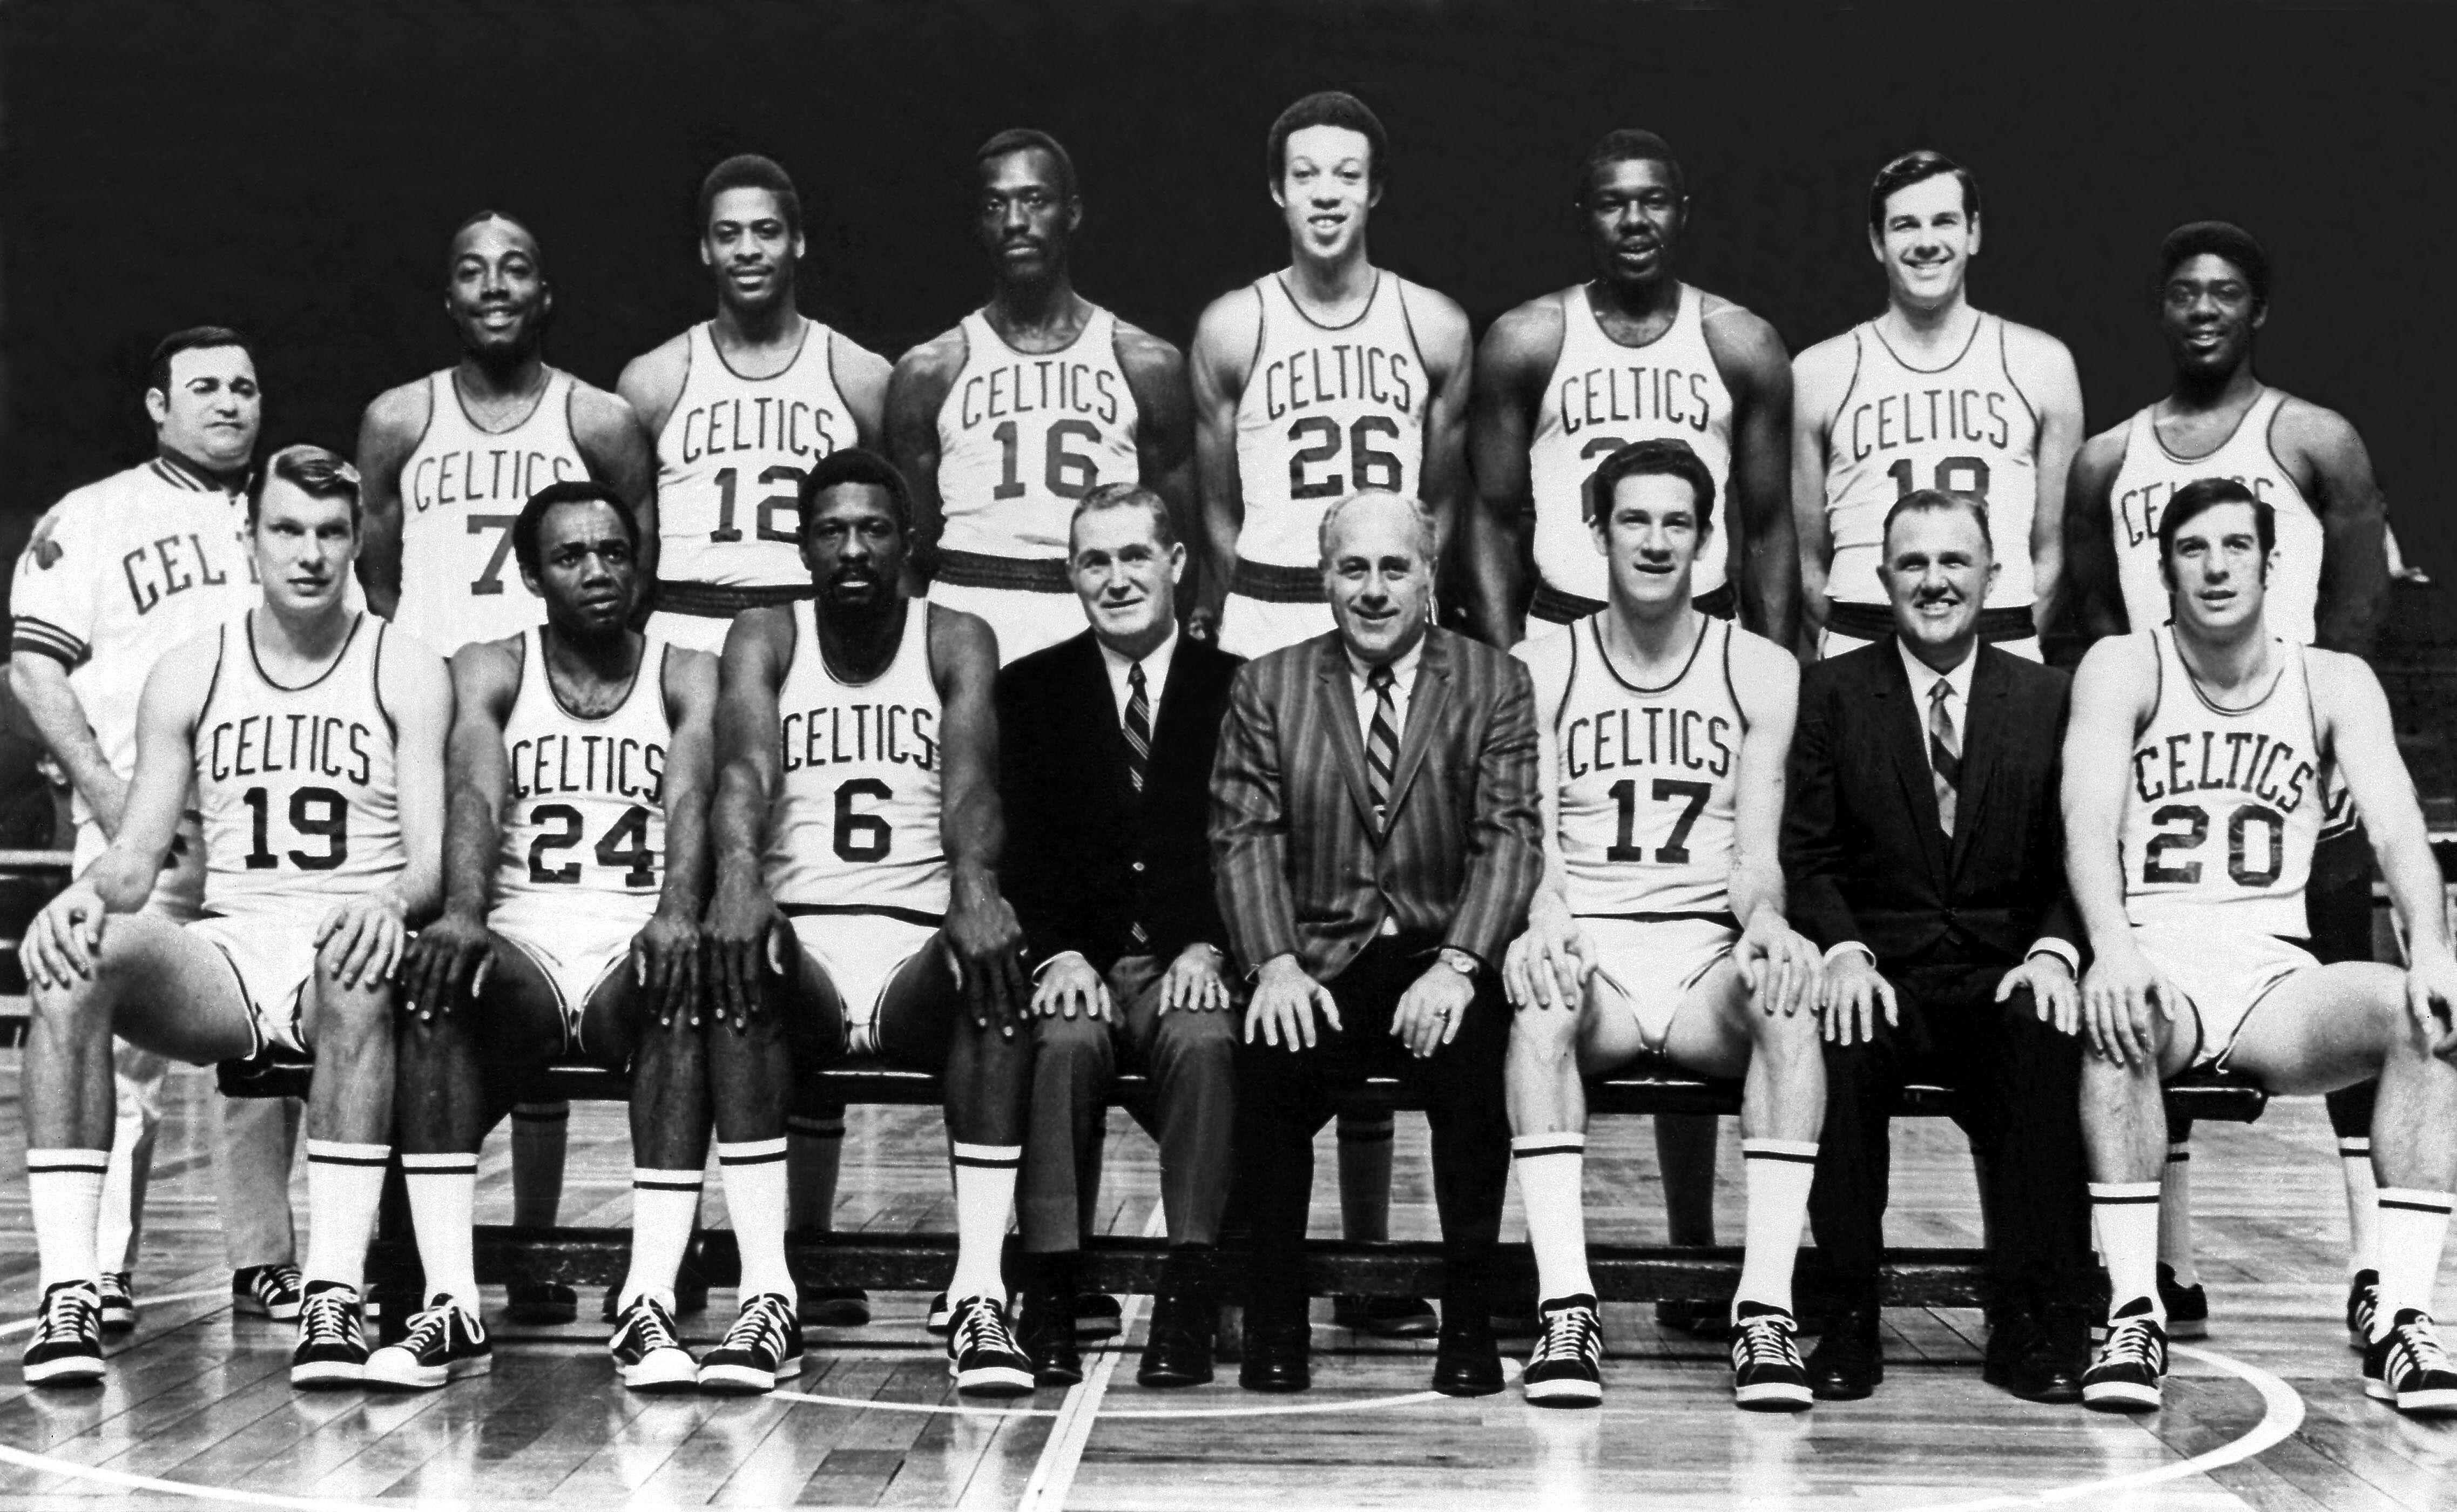 a66f37f5fba Boston Celtics: Top 30 all-time greatest players in Celtics history